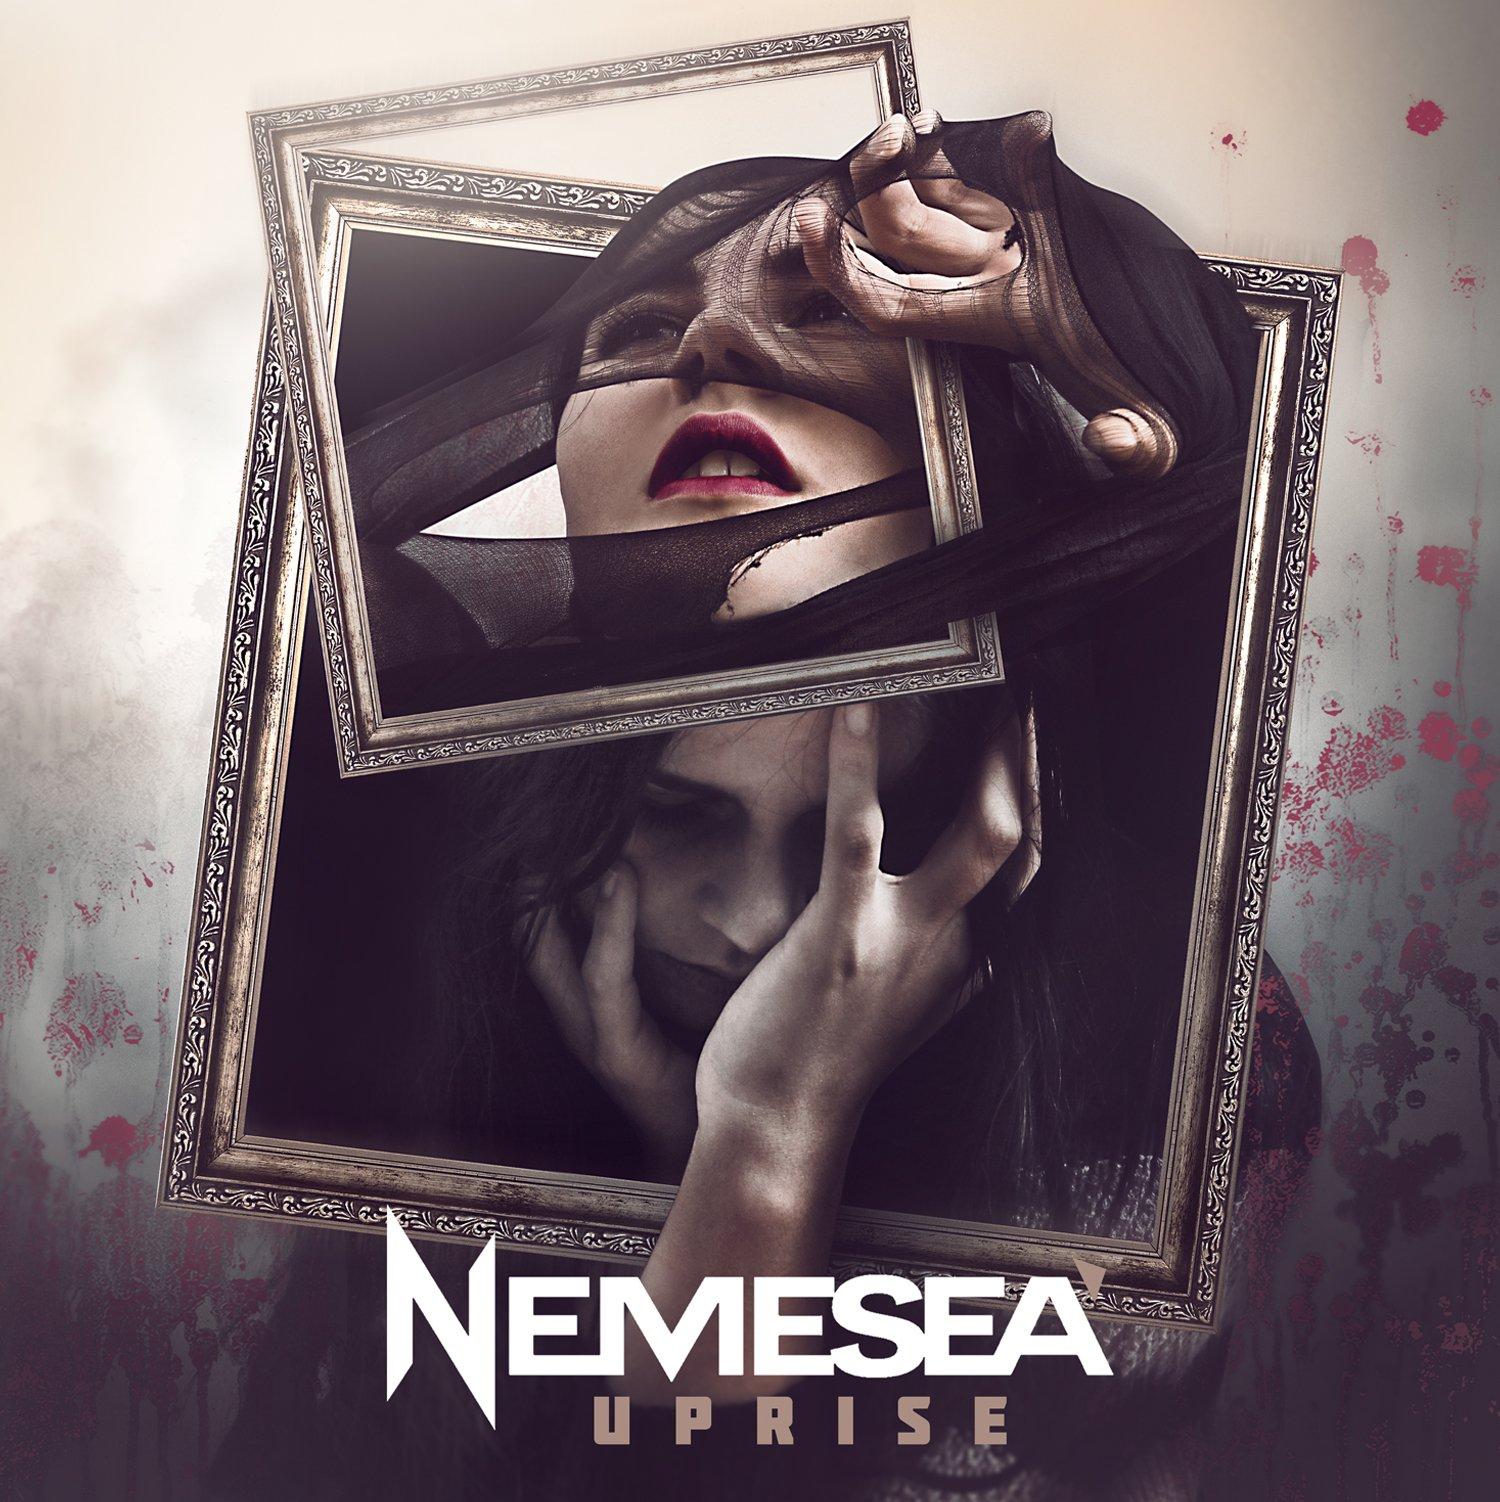 CD : Nemesea - Uprise  (G4C0)